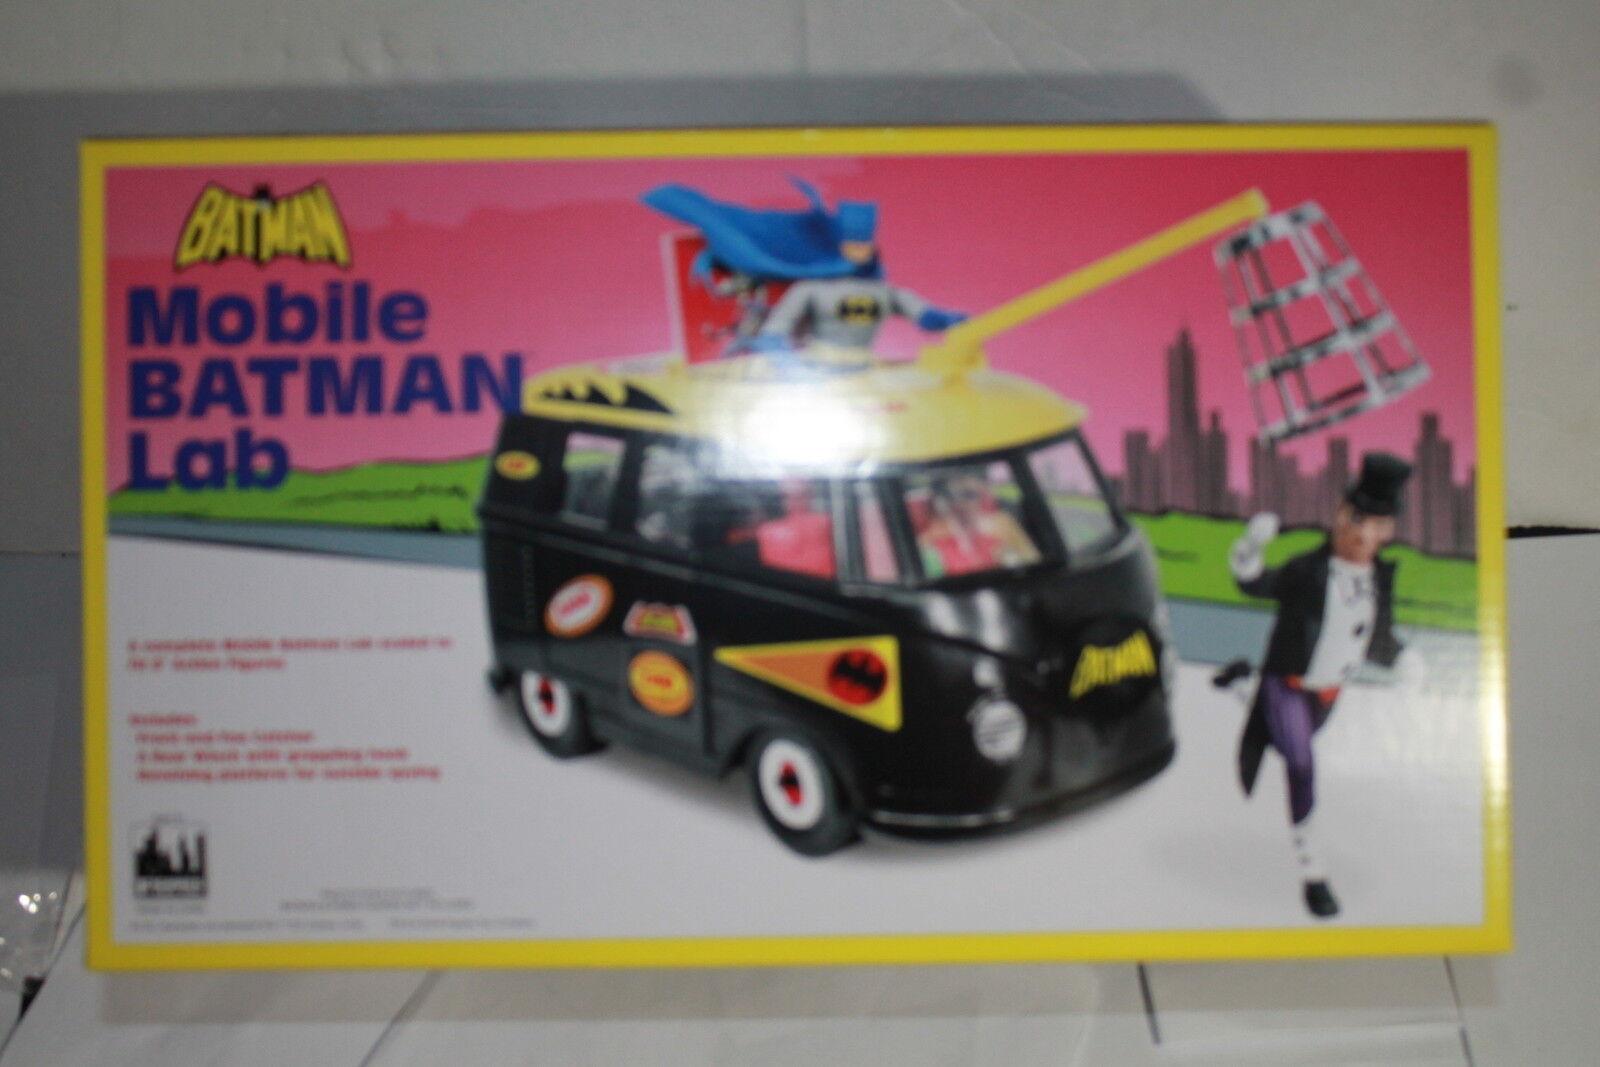 Dc comics bus playset retro - 8 zoll zahlen, batlab w exklusive pinguin misb